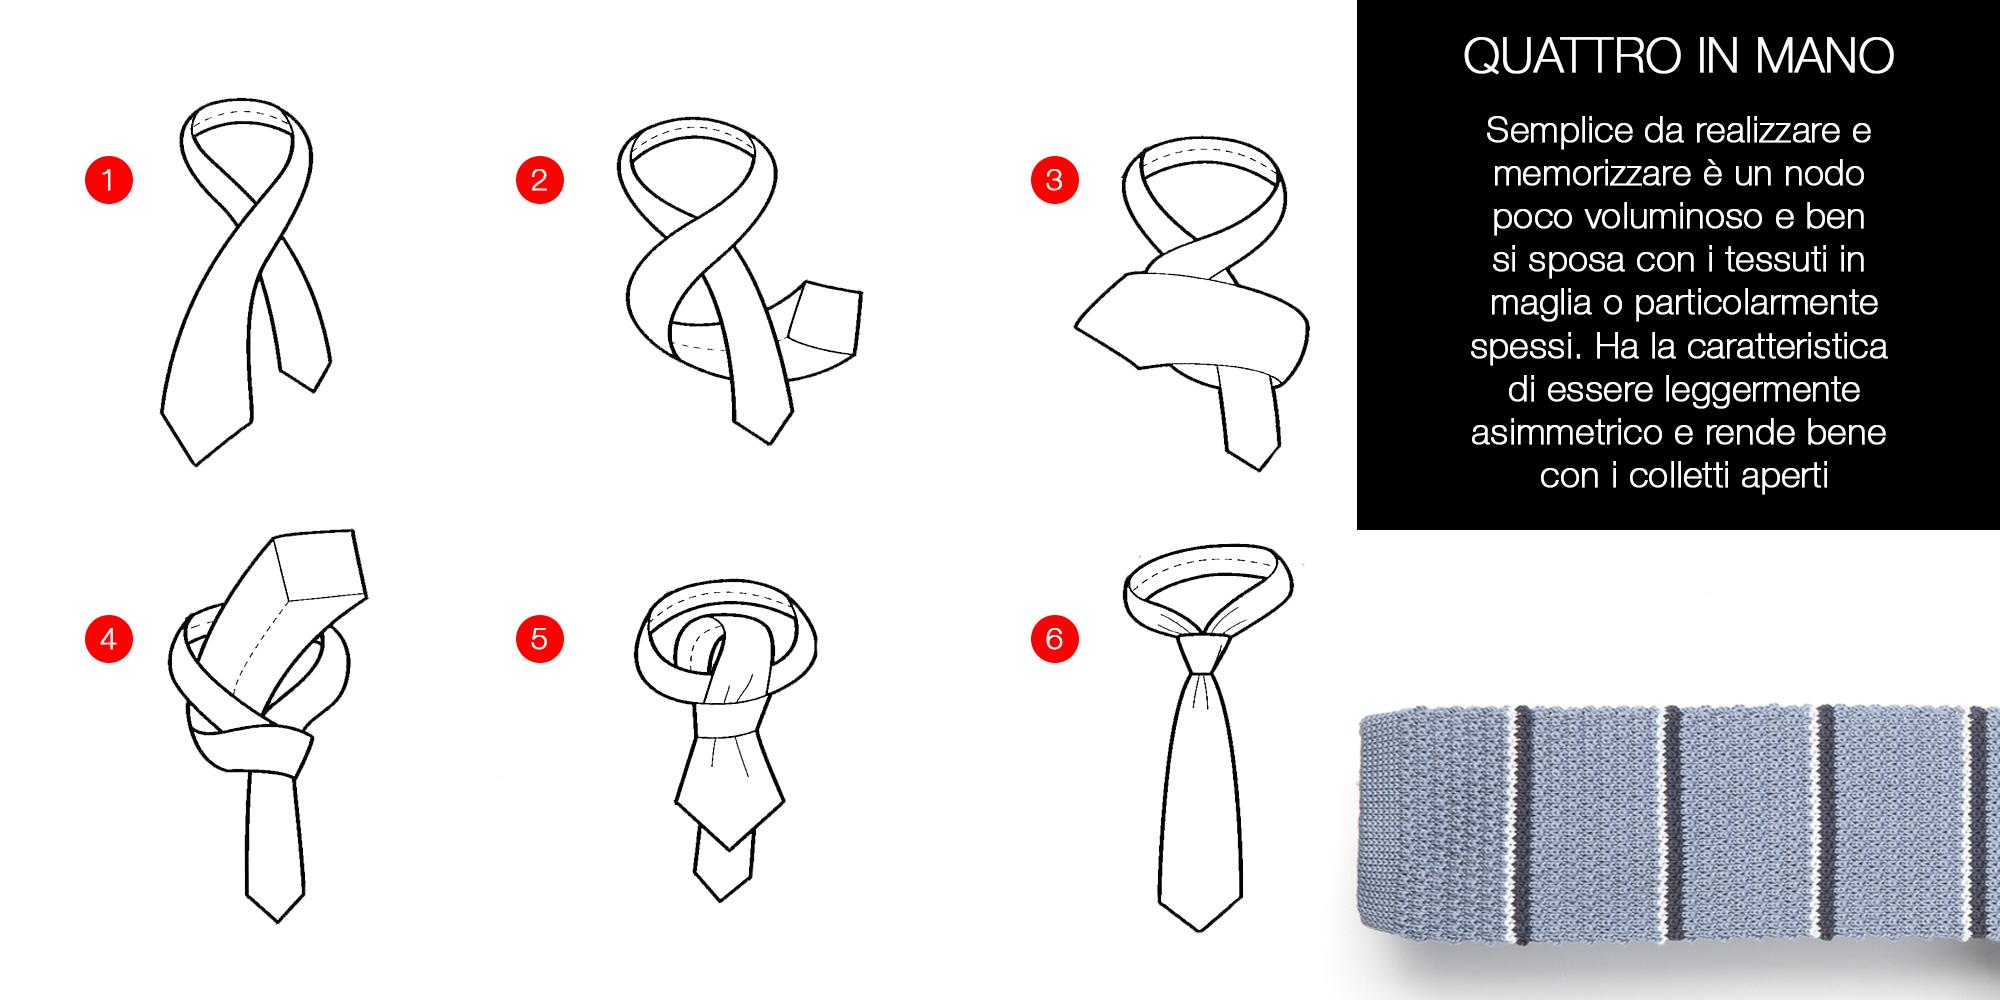 nodo cravatta quattro in mano il gangherista doppelganger